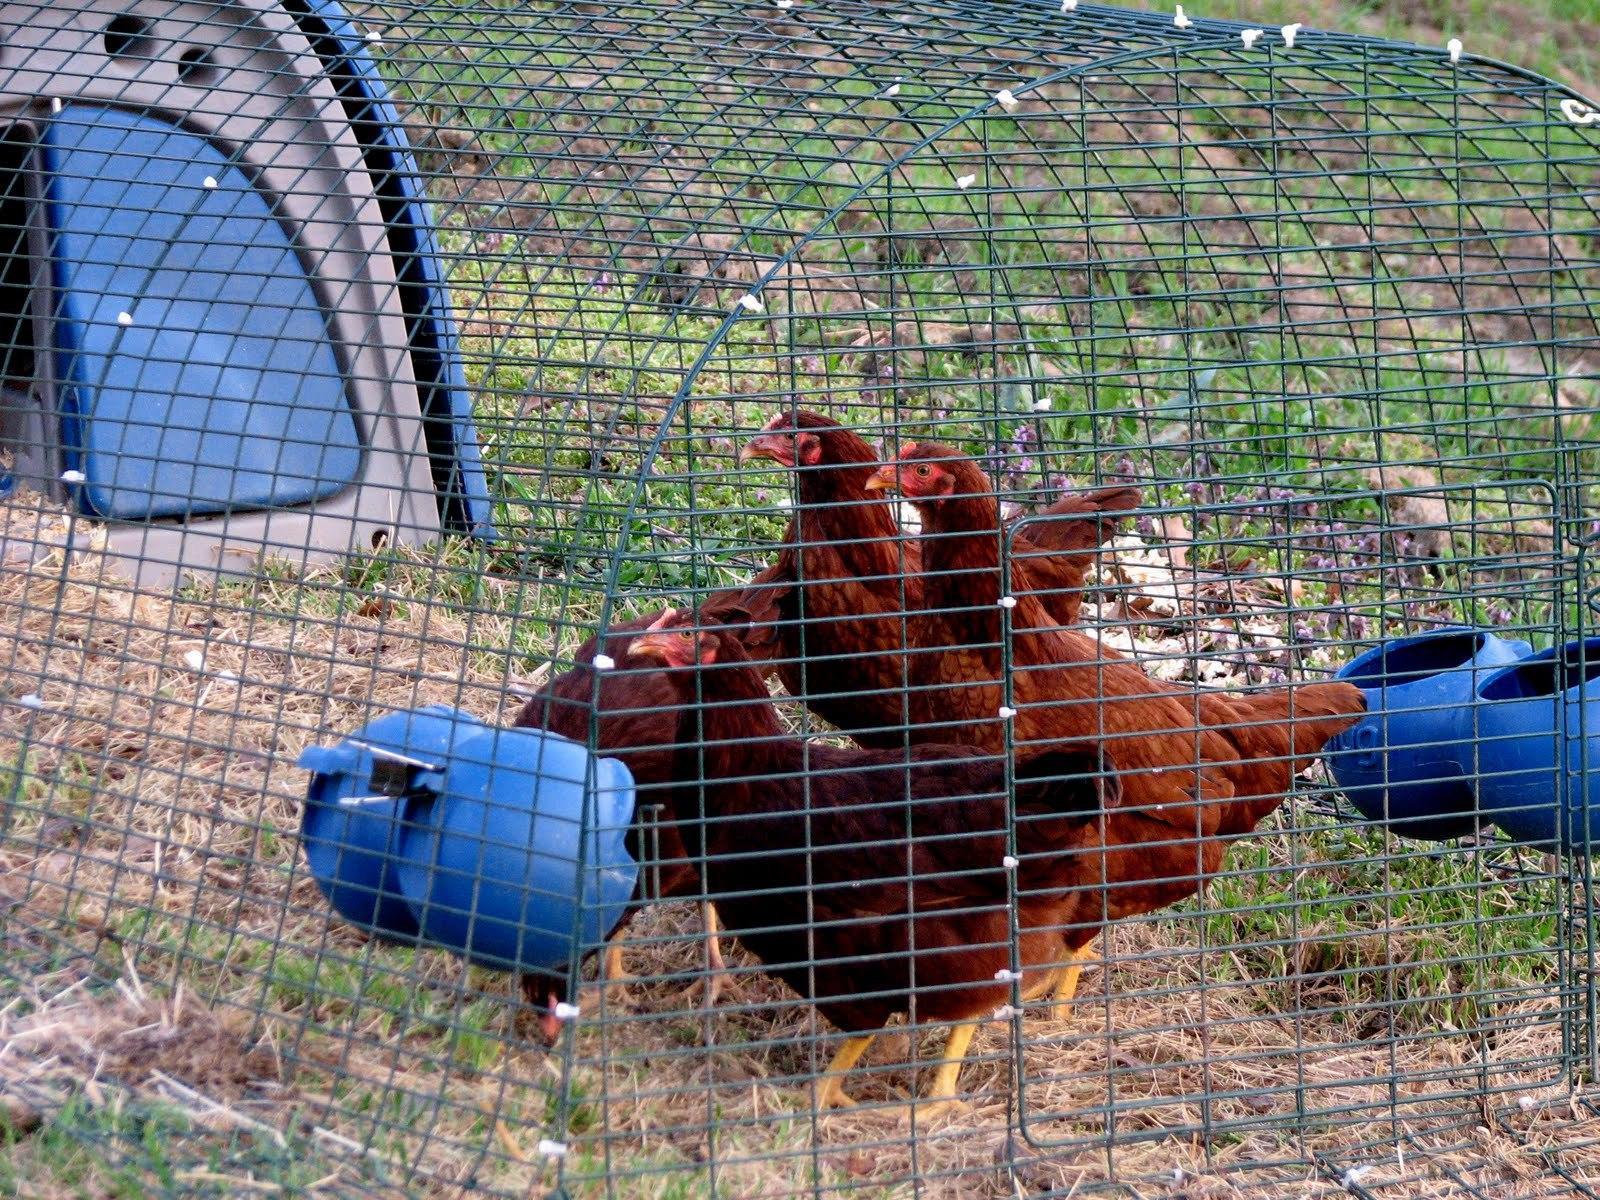 Farming Stinks